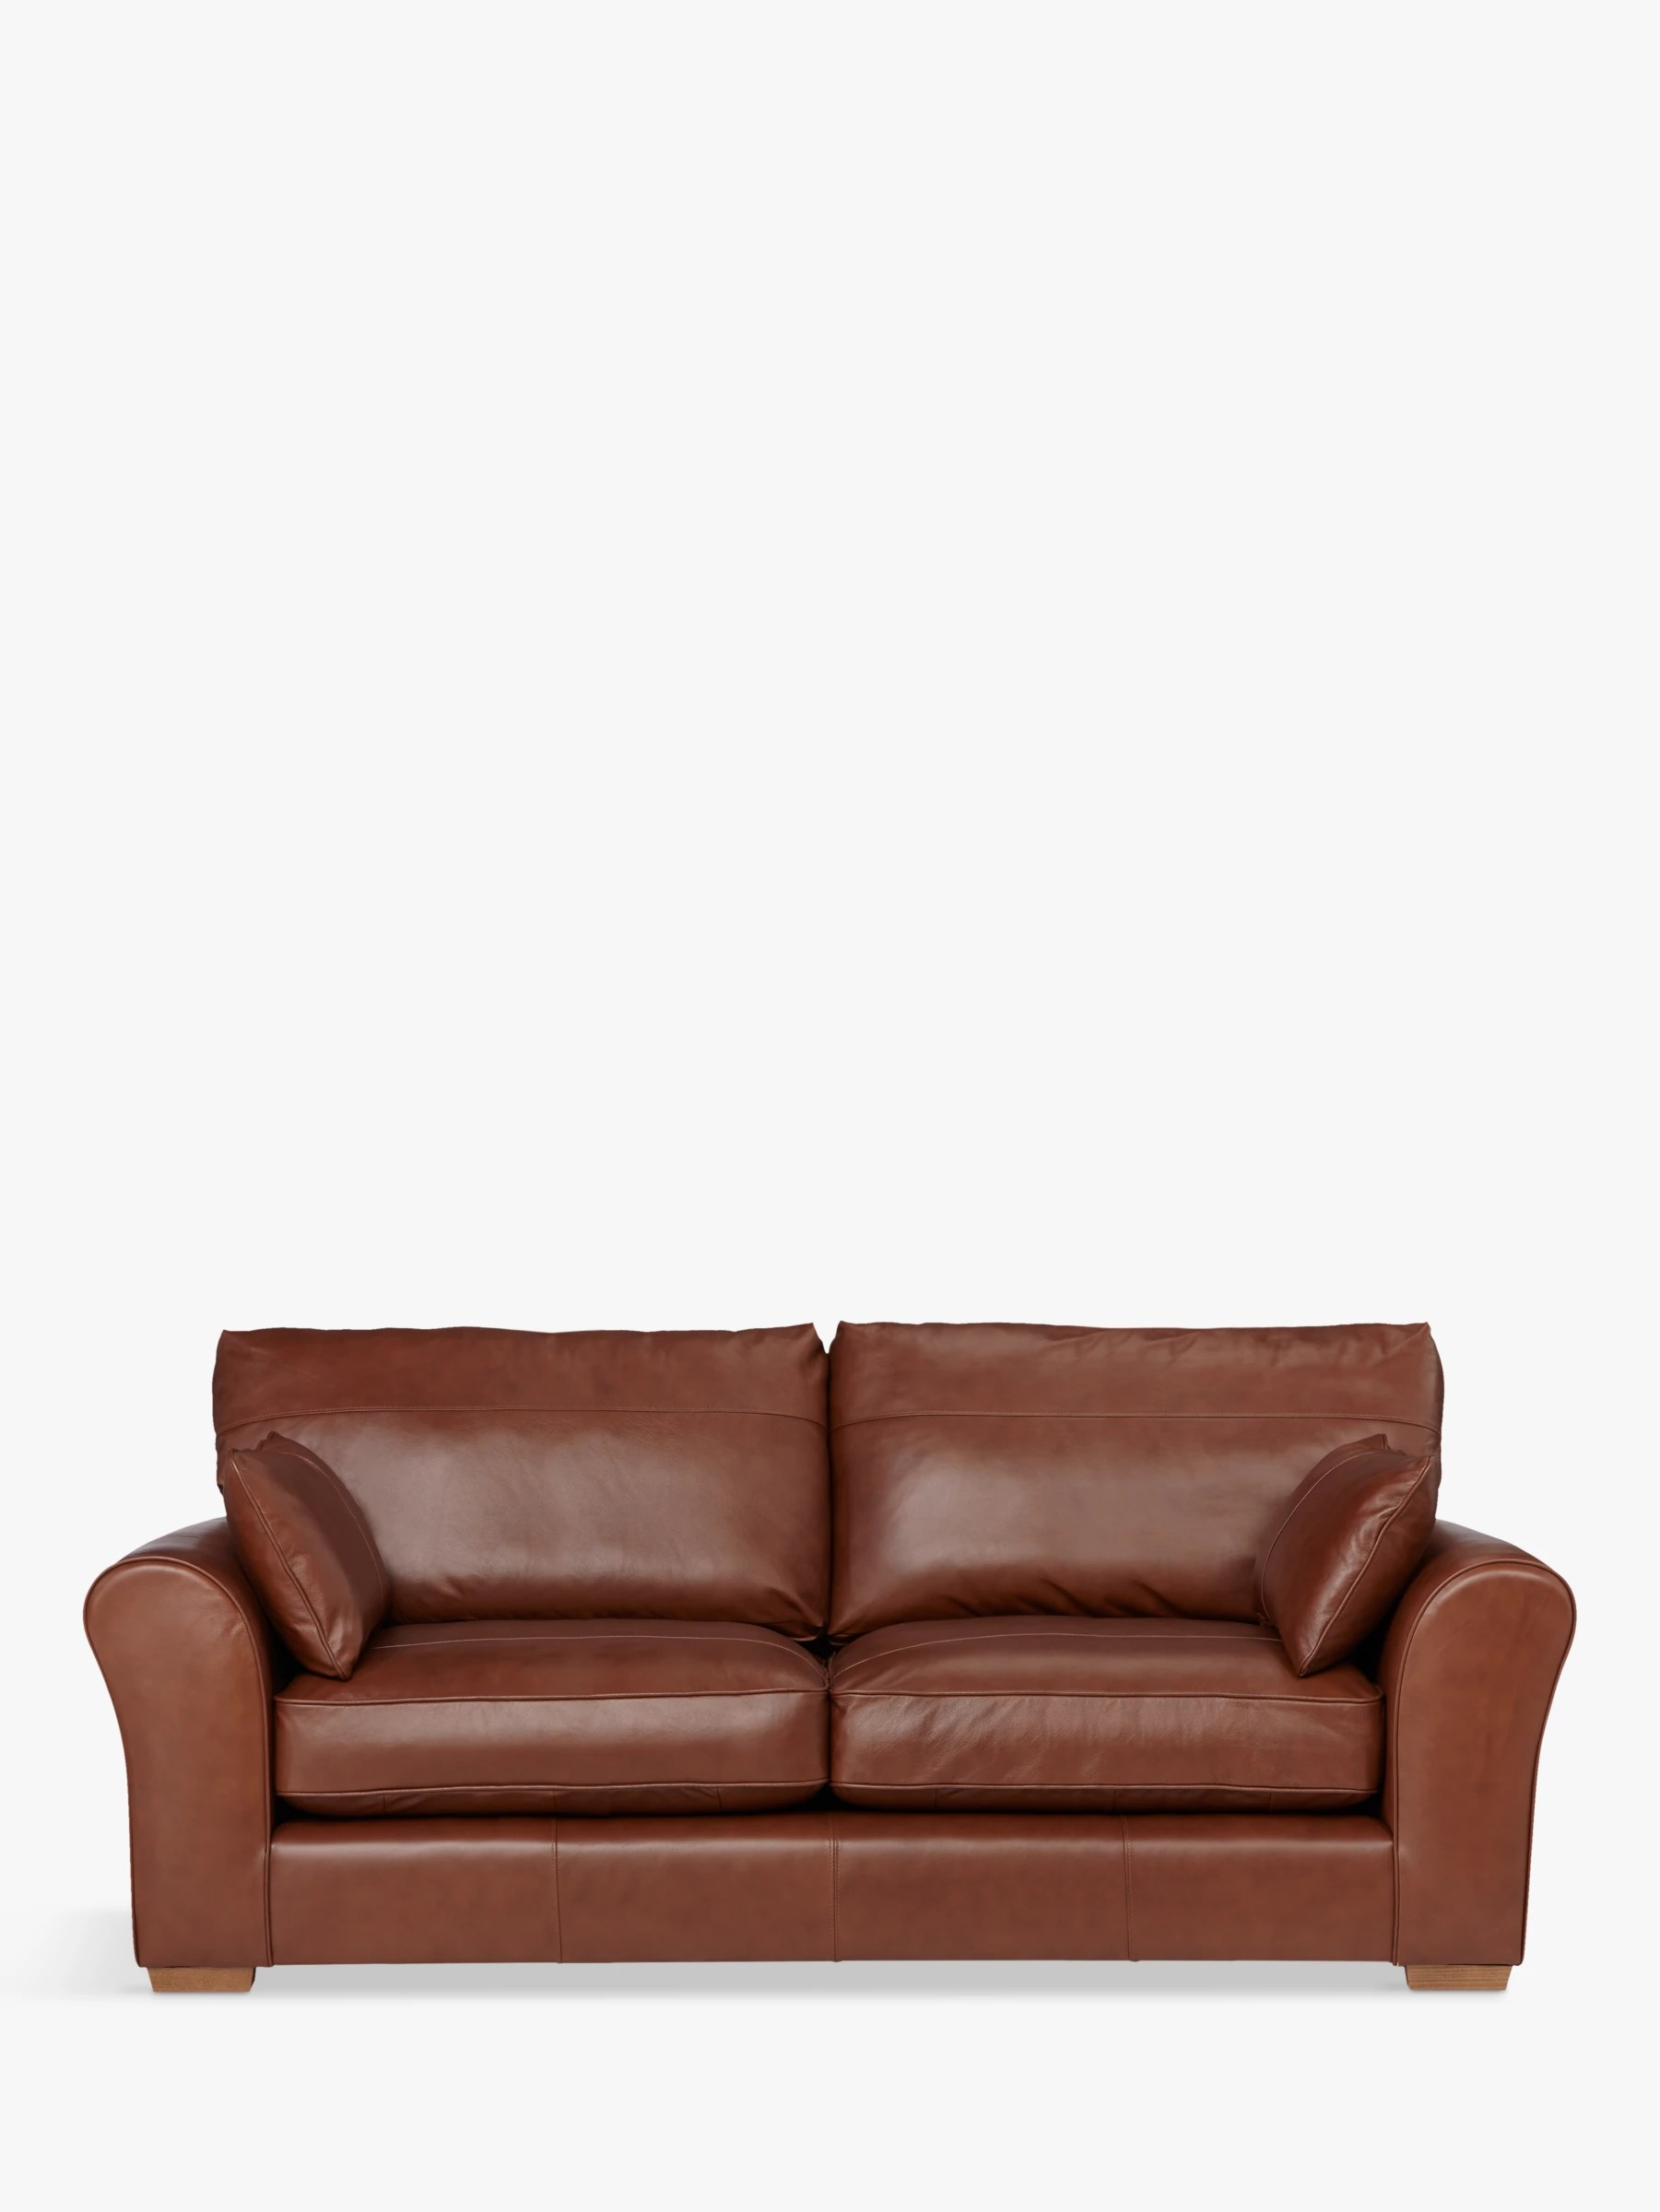 leather sofa cleaning shampoo ashley furniture commando black john lewis cleaner brokeasshome